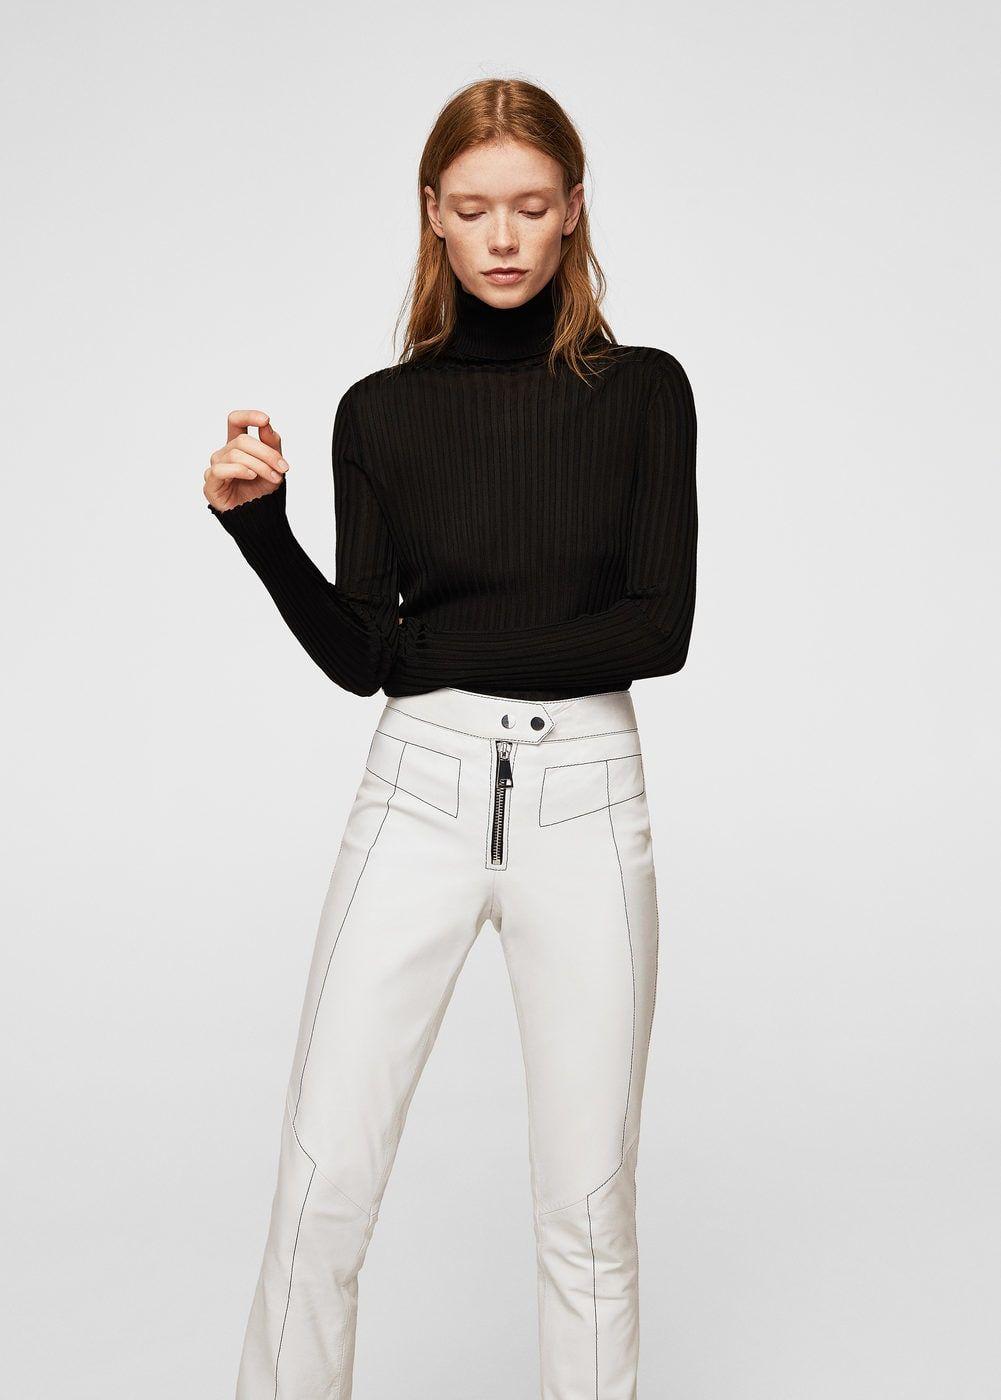 d903218f1aaa Pantalon cuir coutures contrastantes - Femme   CLOTHES   Pinterest ...